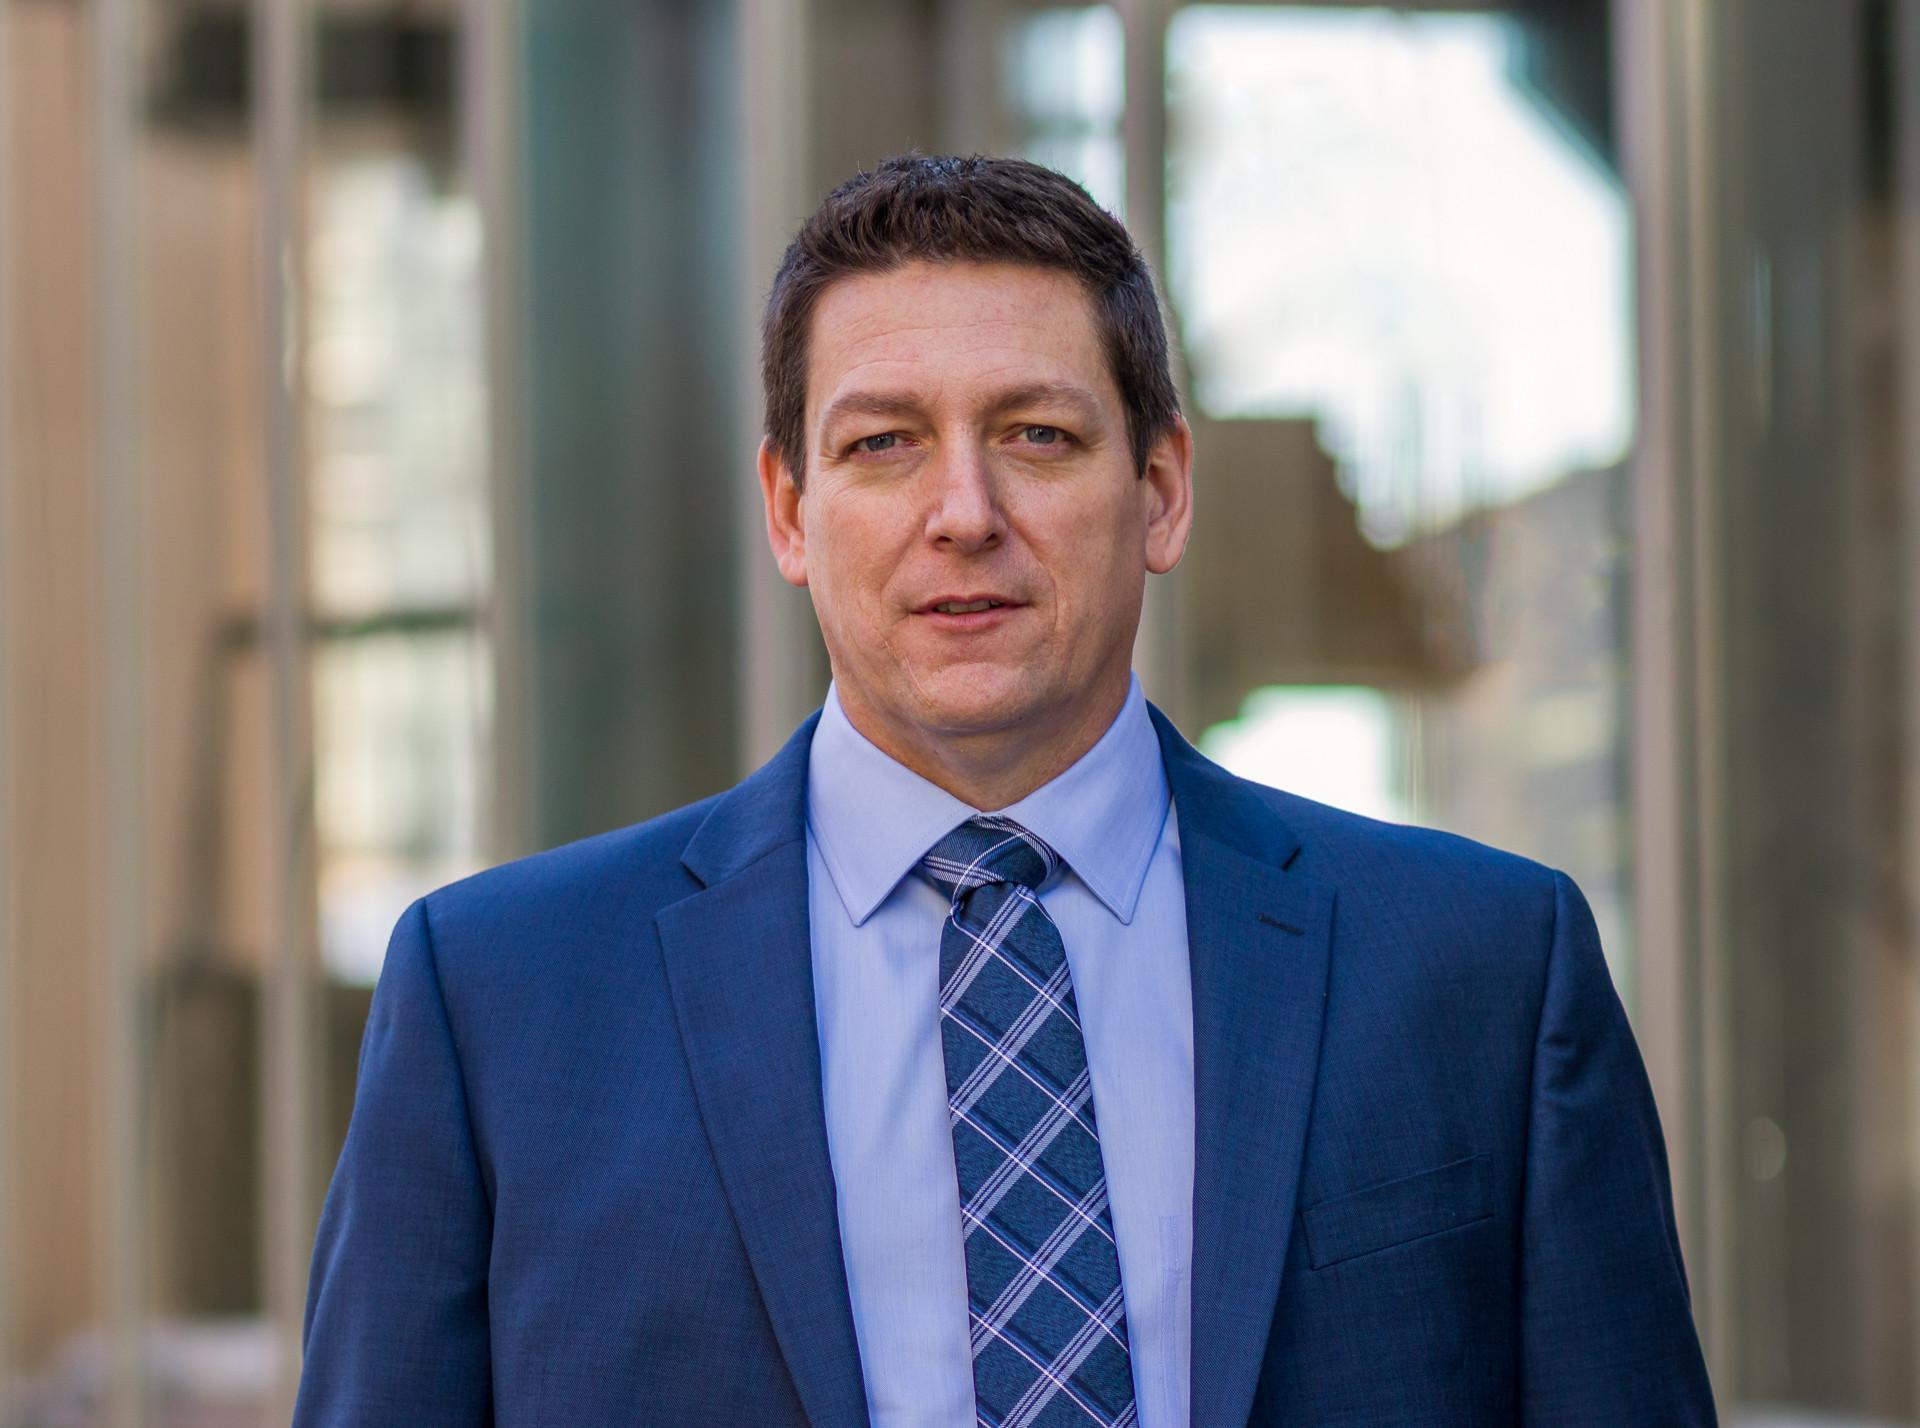 Calgary headshot, Real Estate Investor. Colin Graham